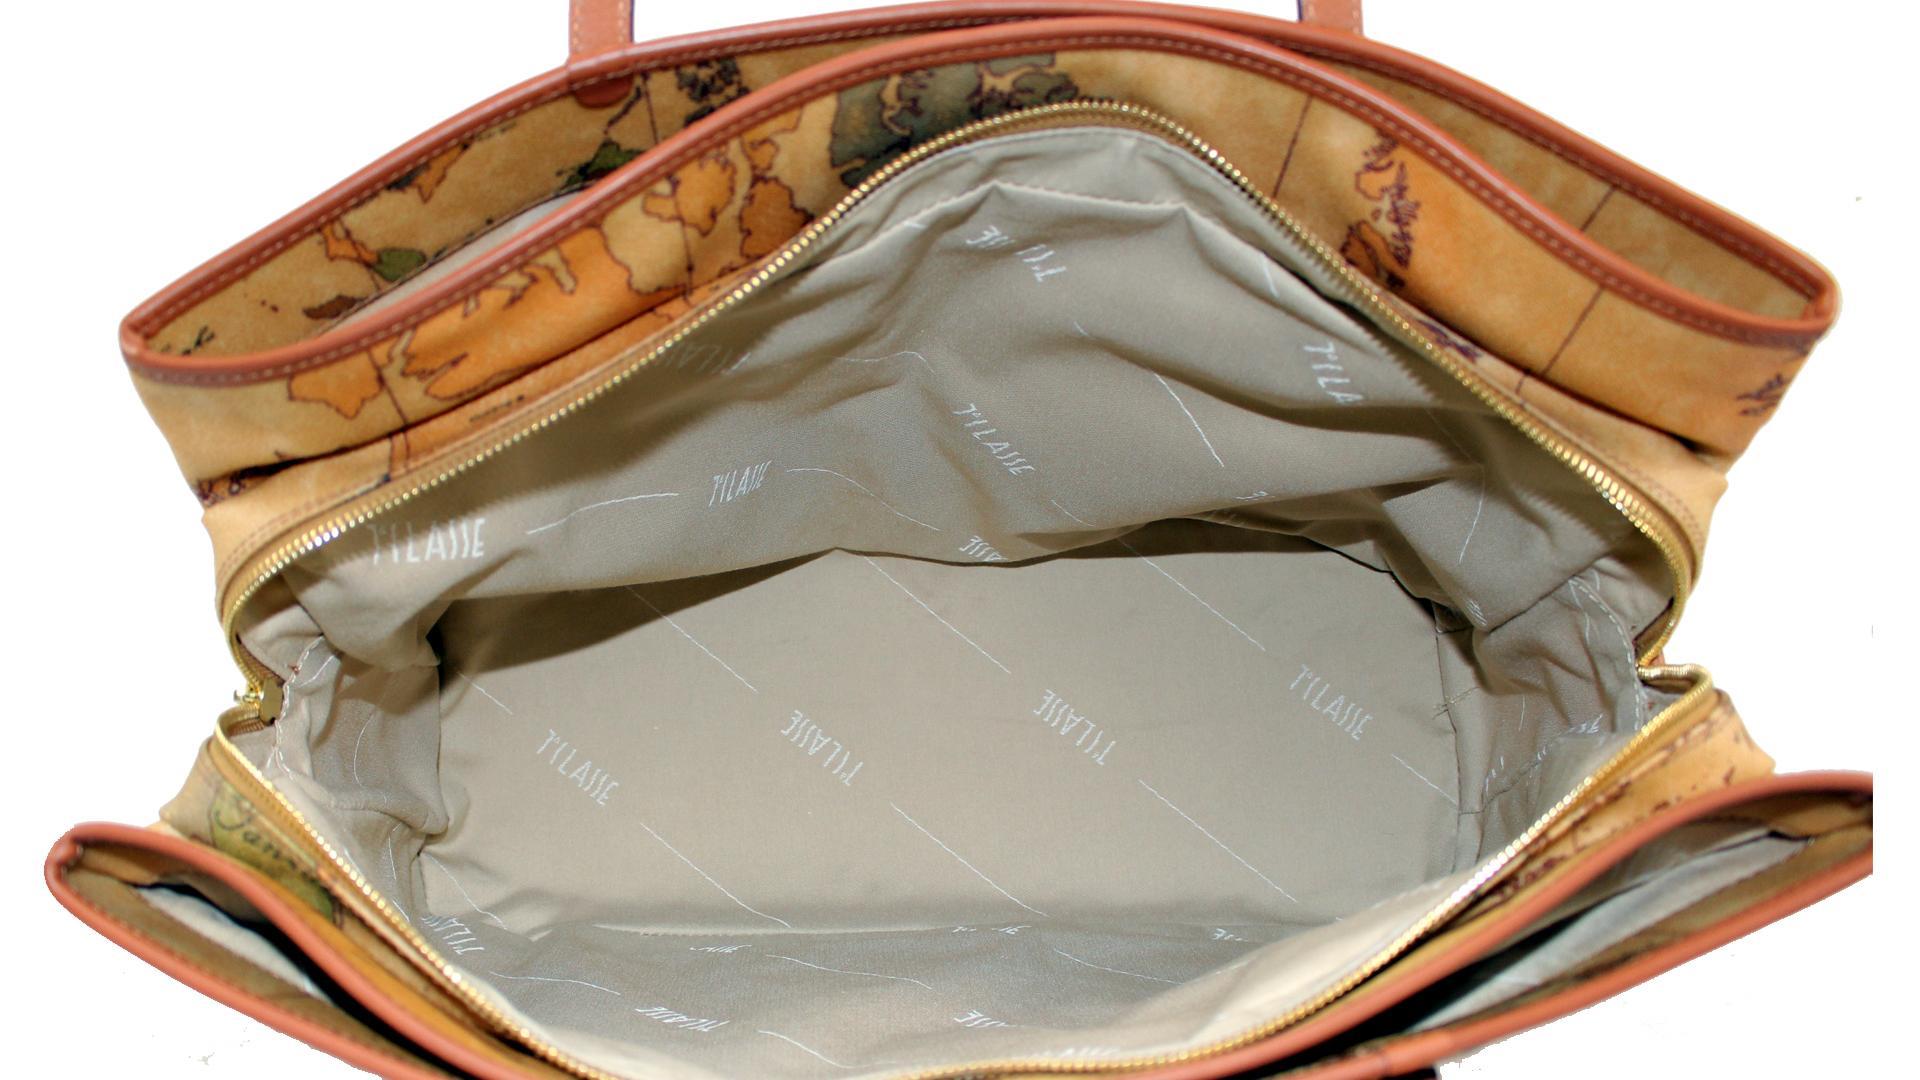 Shopping bag  Alviero Martini 1A Classe New Classic D024 6000 010 Classico